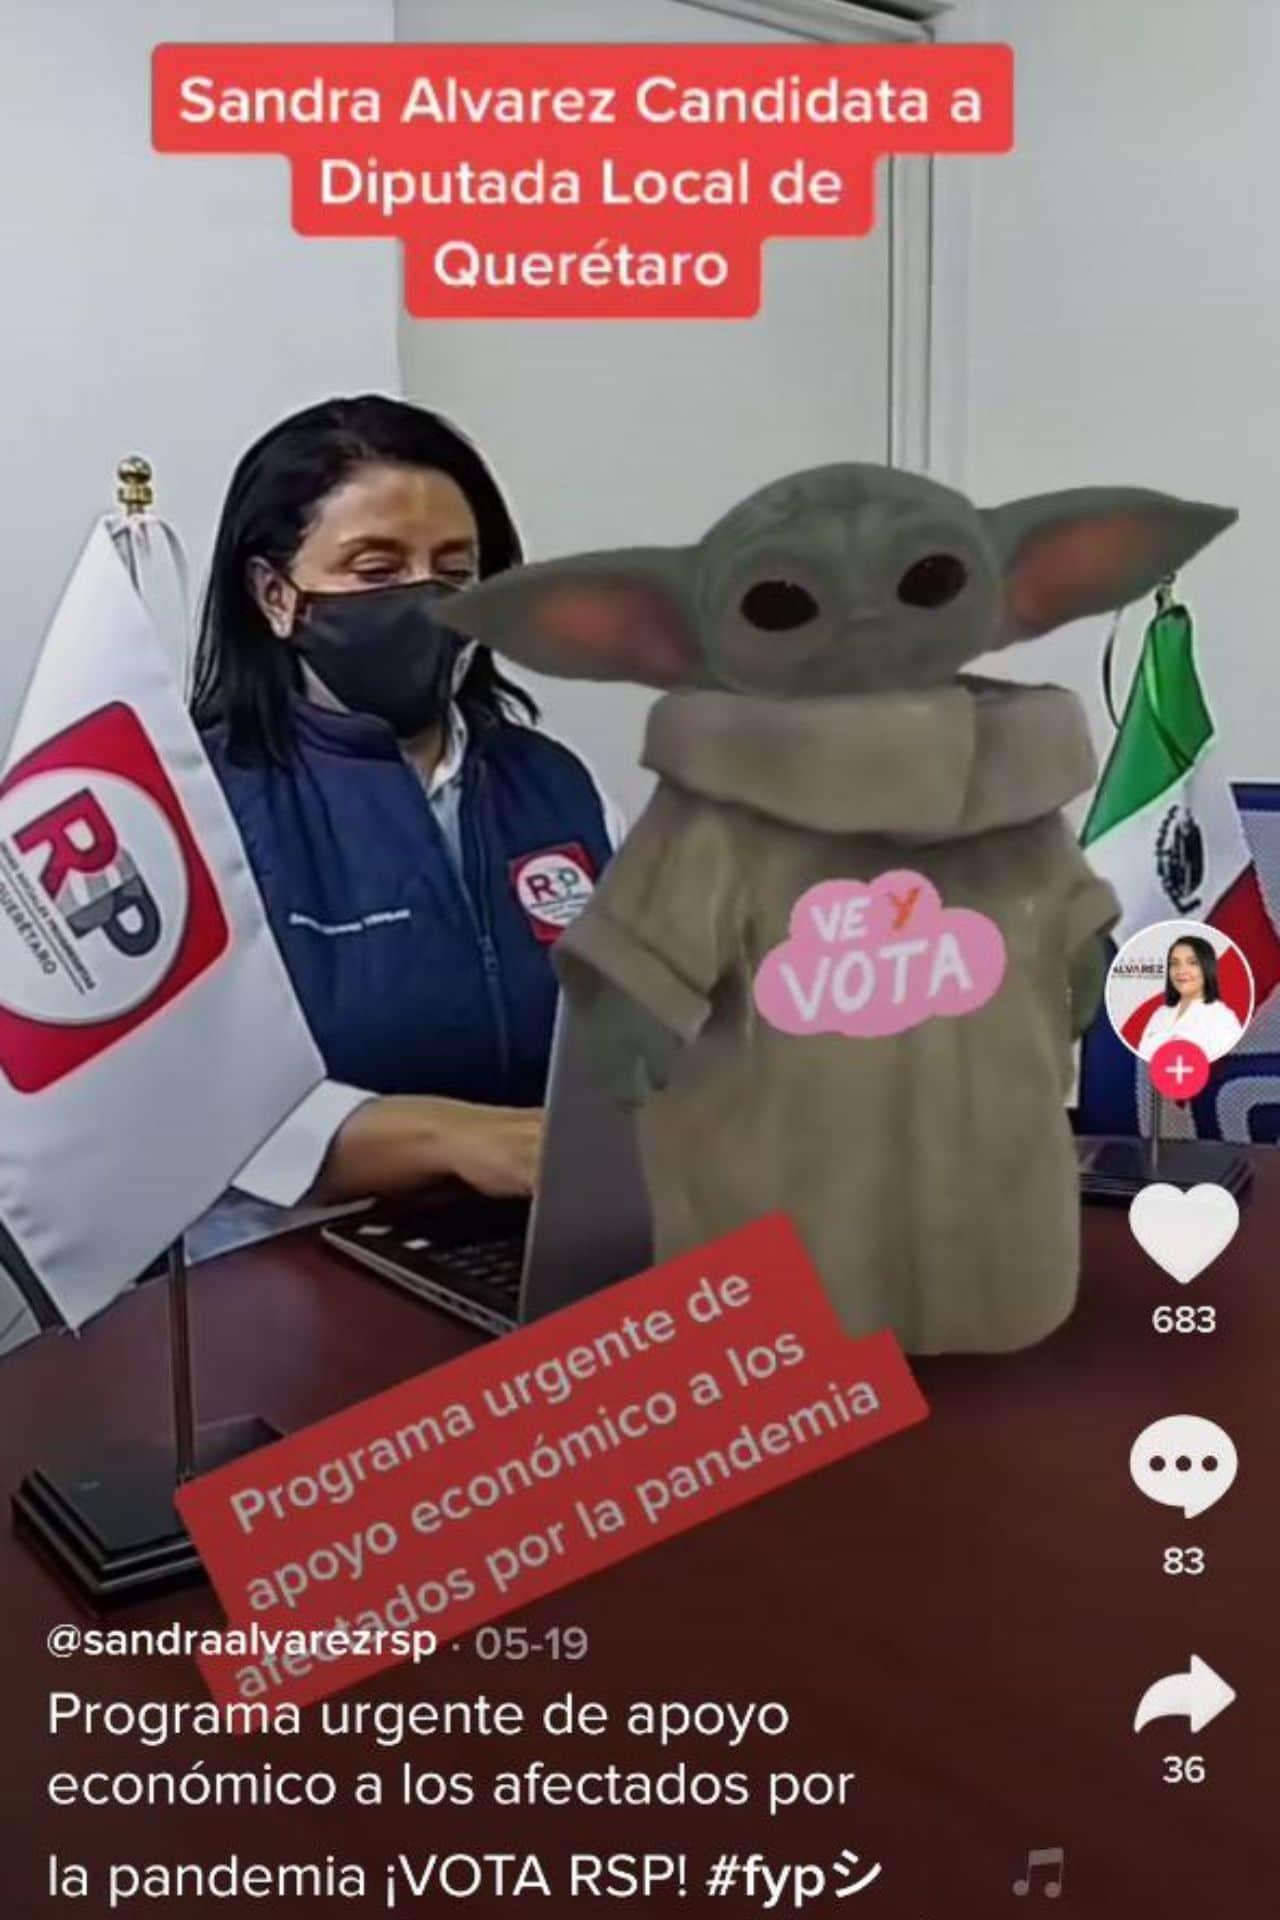 candidata Sandra Álvarez TikTok